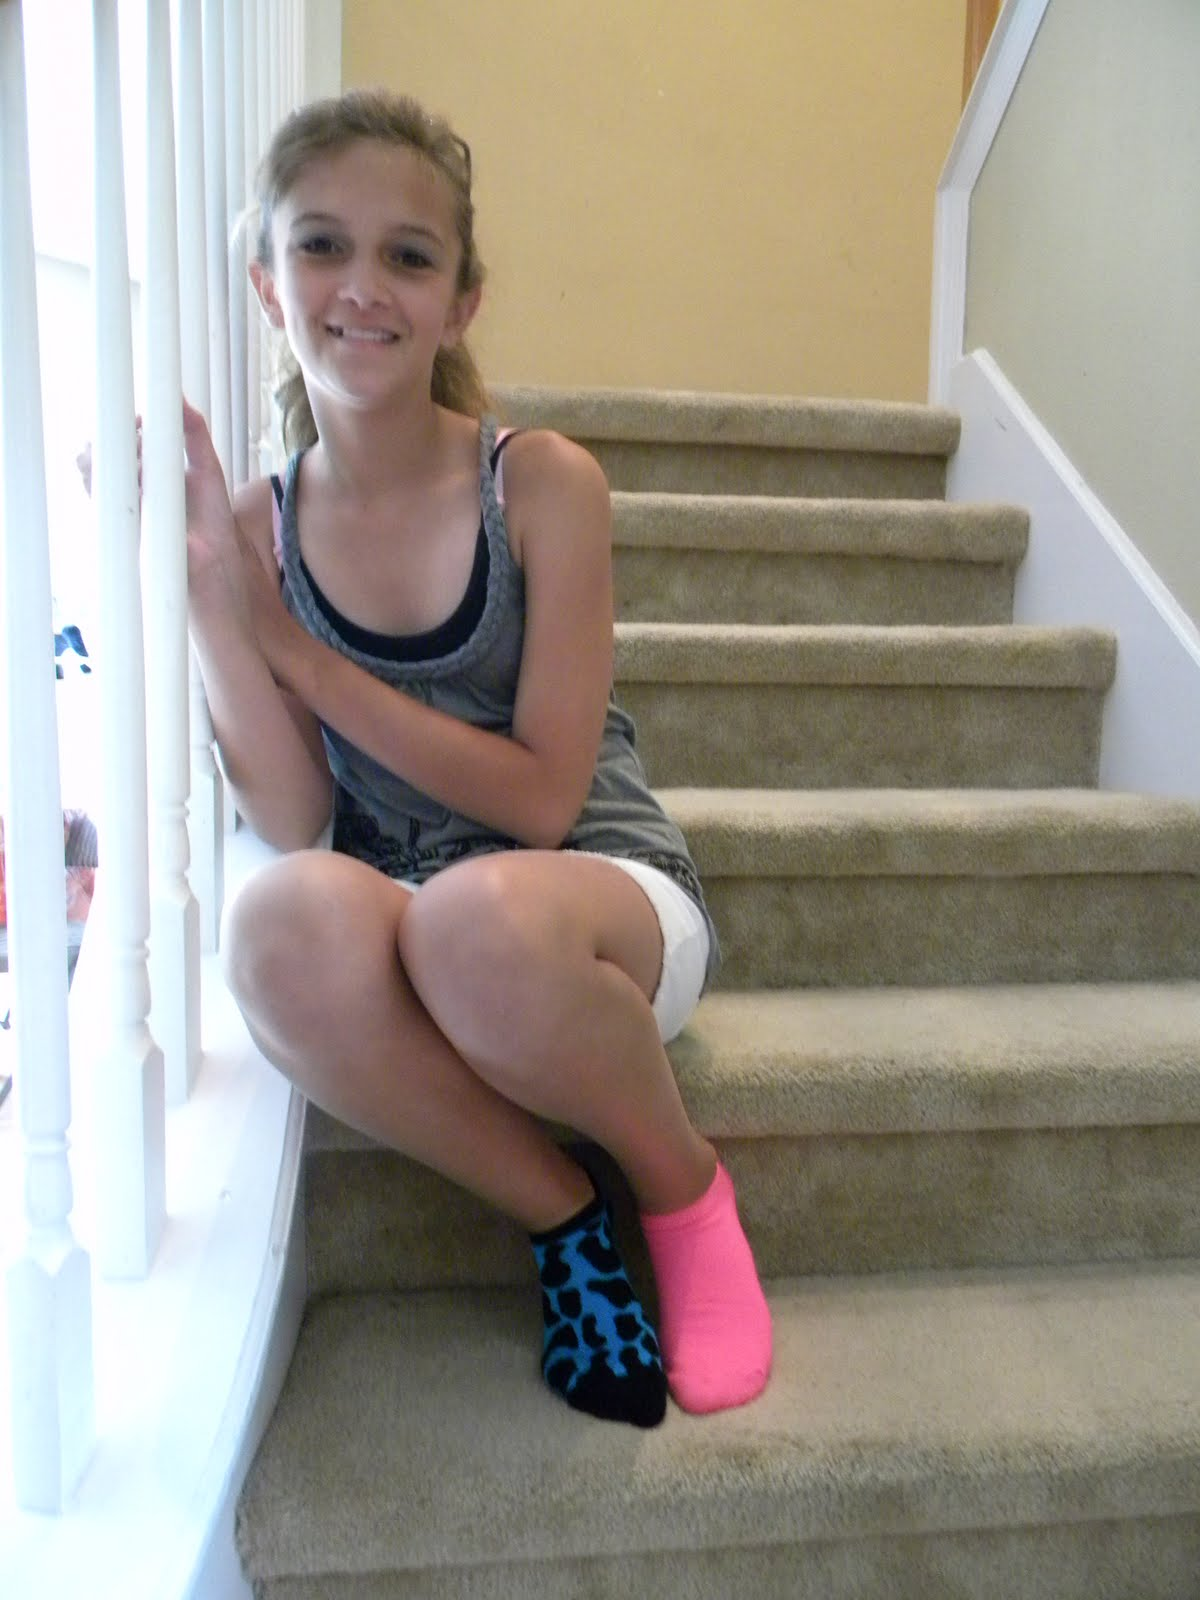 socks wearing teens Cute girls